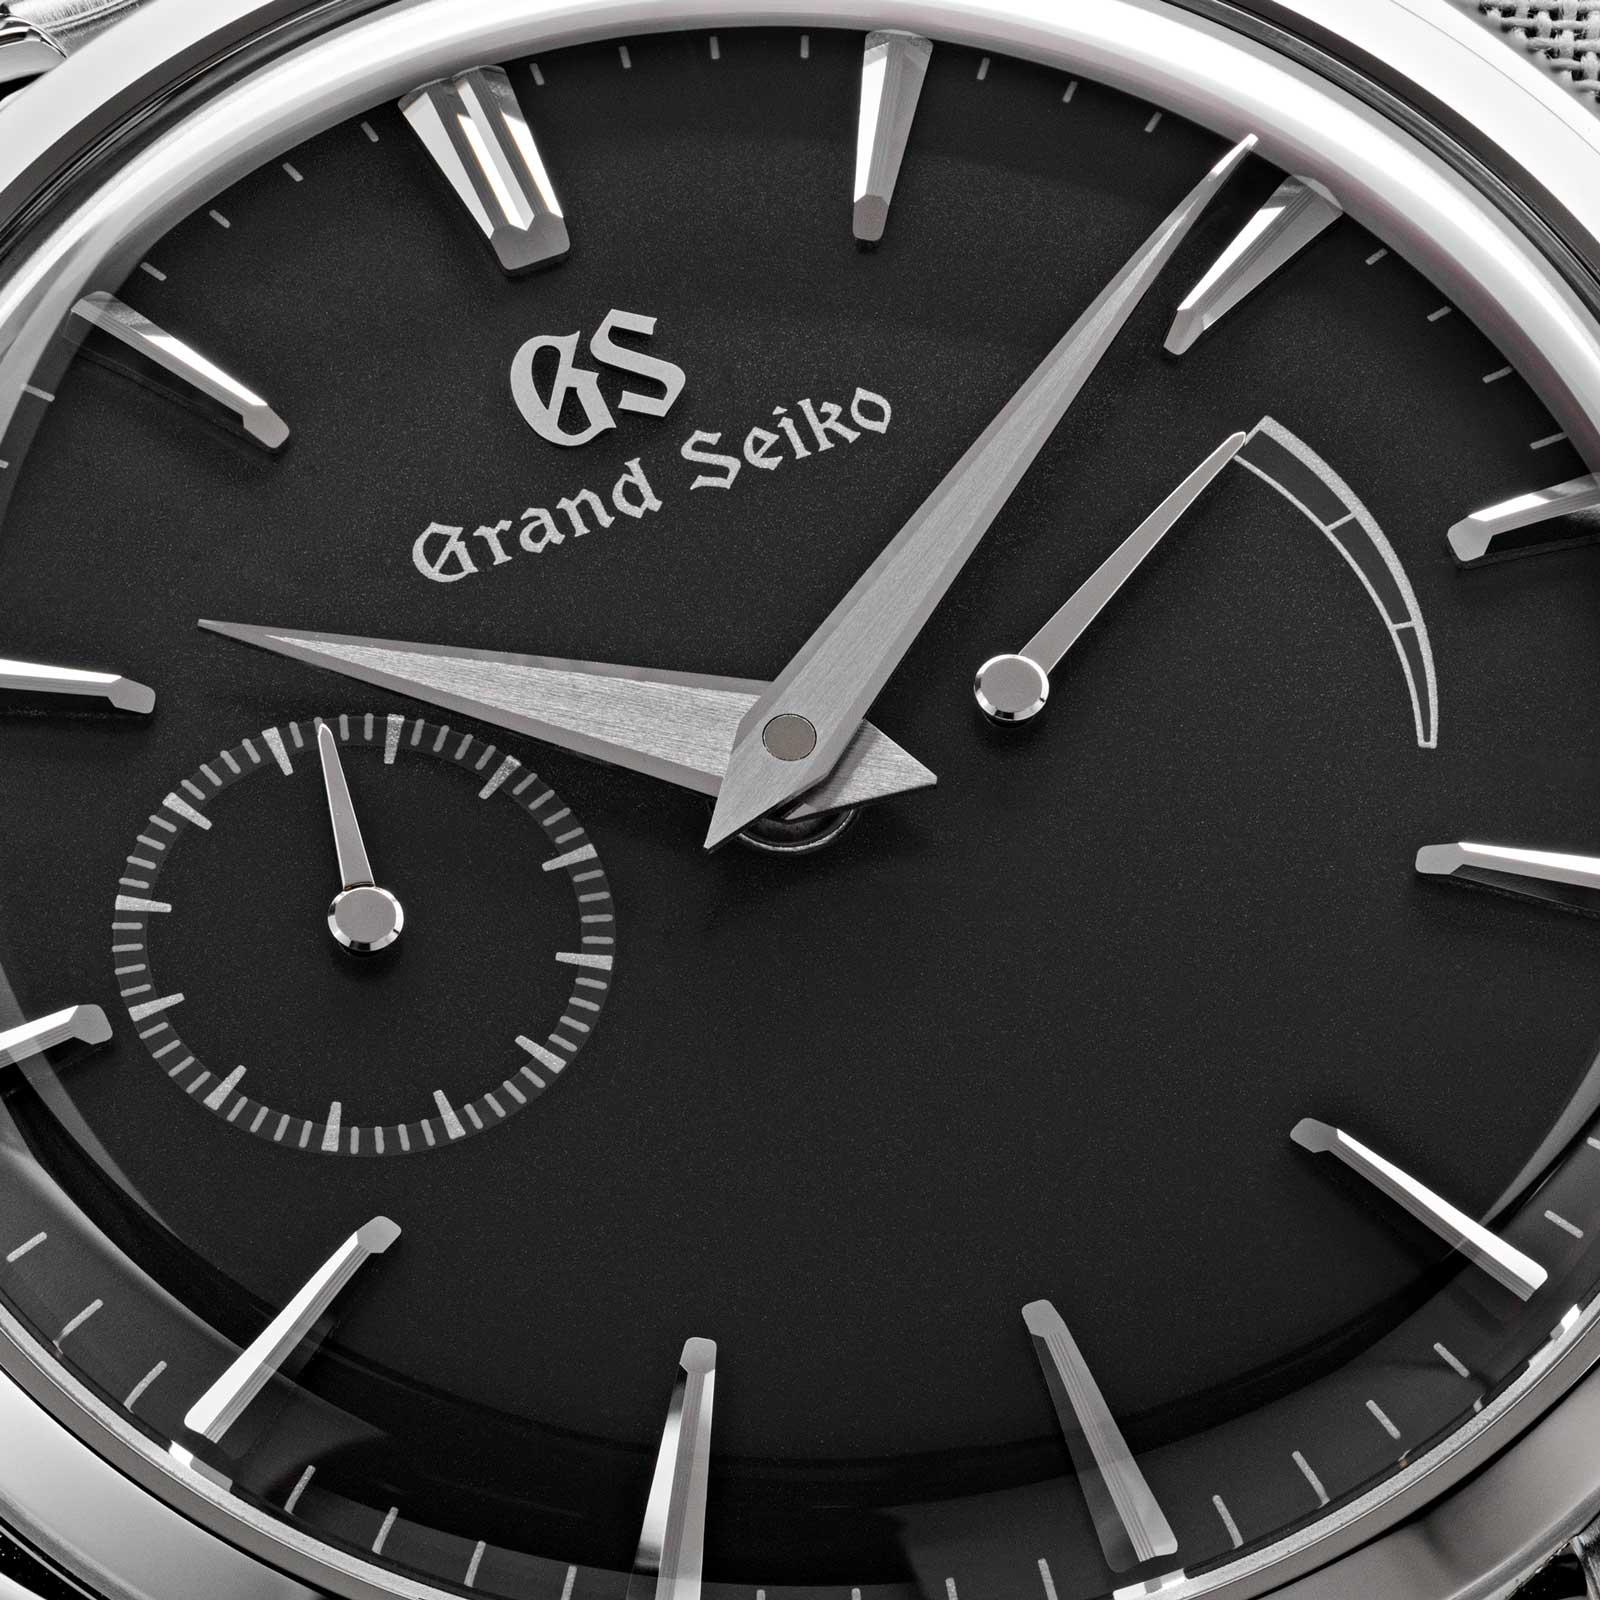 Grand Seiko SBGK009 grey dial power reserve luxury men's dress watch.